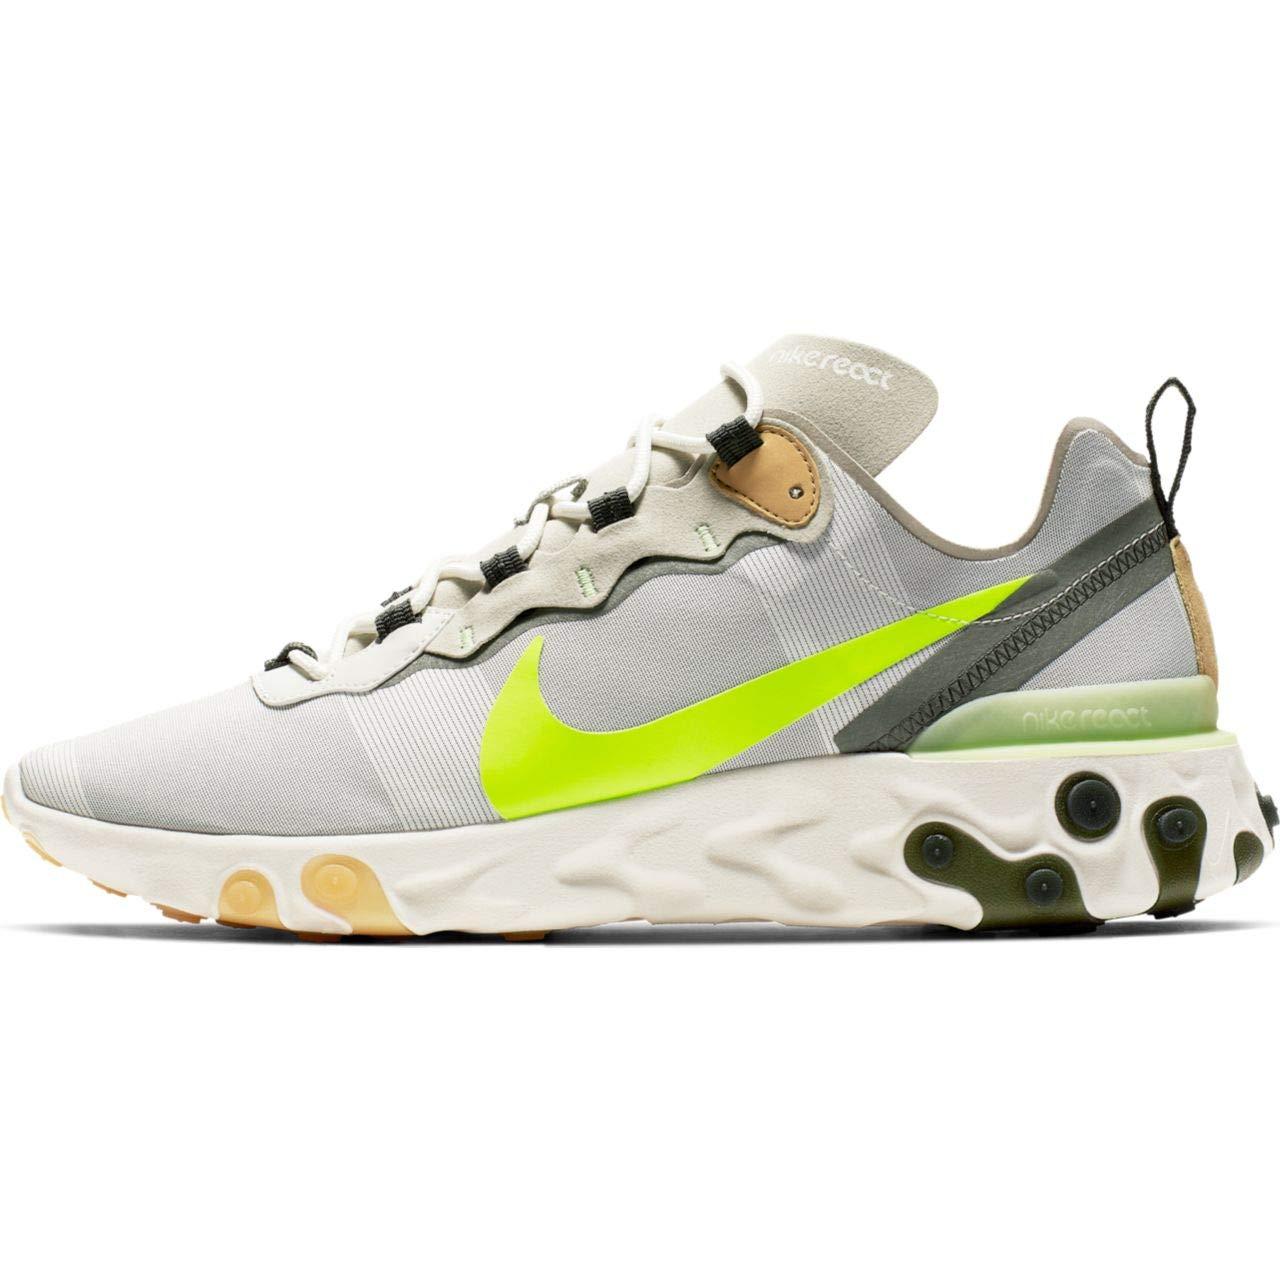 MultiCouleure (Spruce Aura Volt Spruce Fog Barely Volt 000) 44 EU Nike React EleHommest 55, Chaussures d'Athlétisme Homme